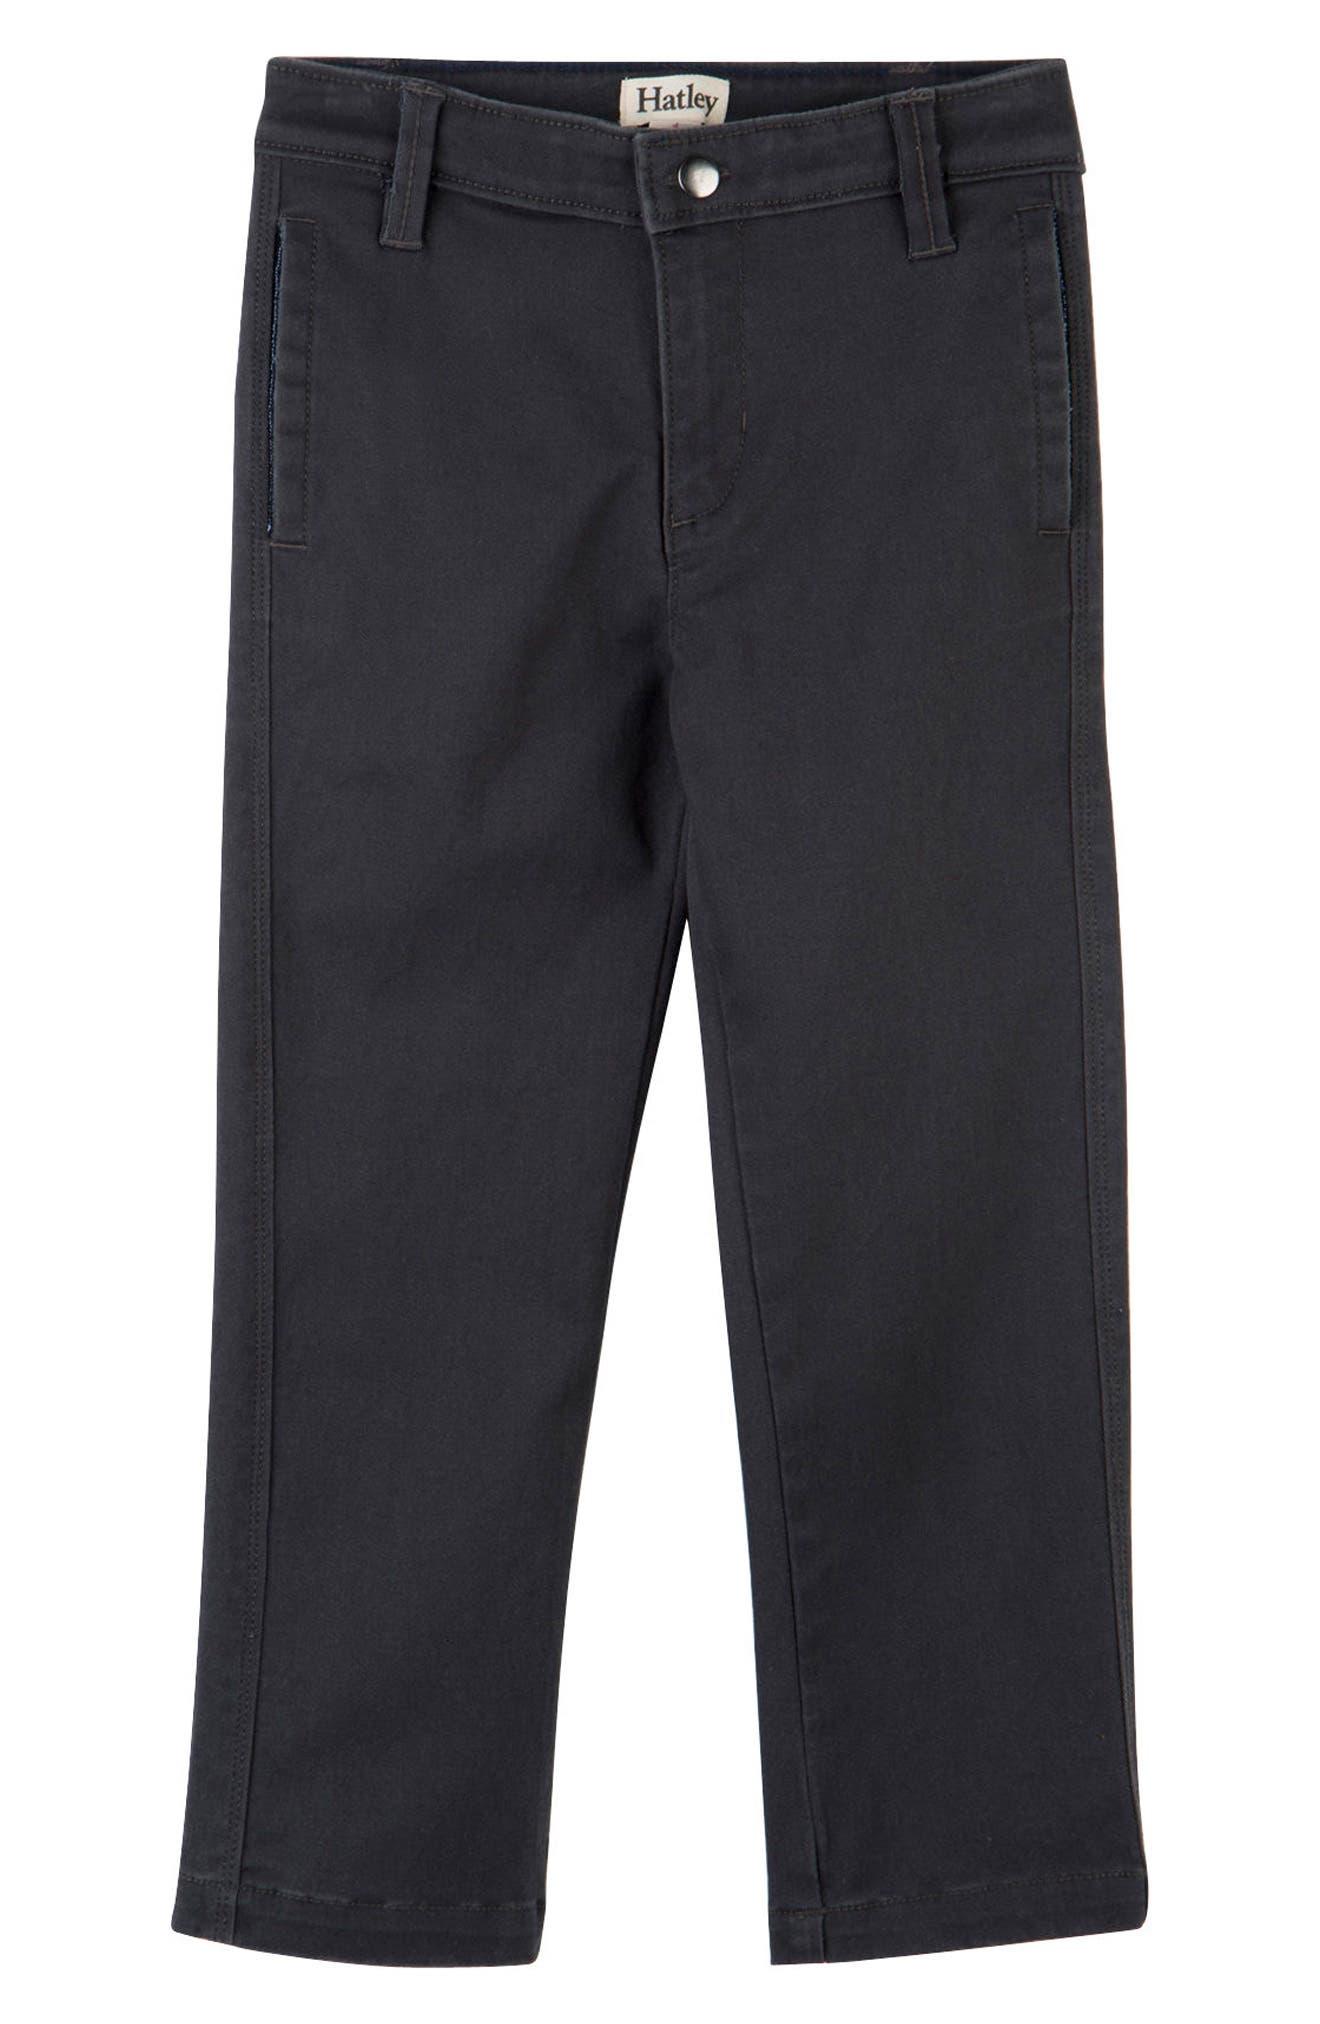 Boys Hatley Stretch Cotton Twill Pants Size 4  Grey